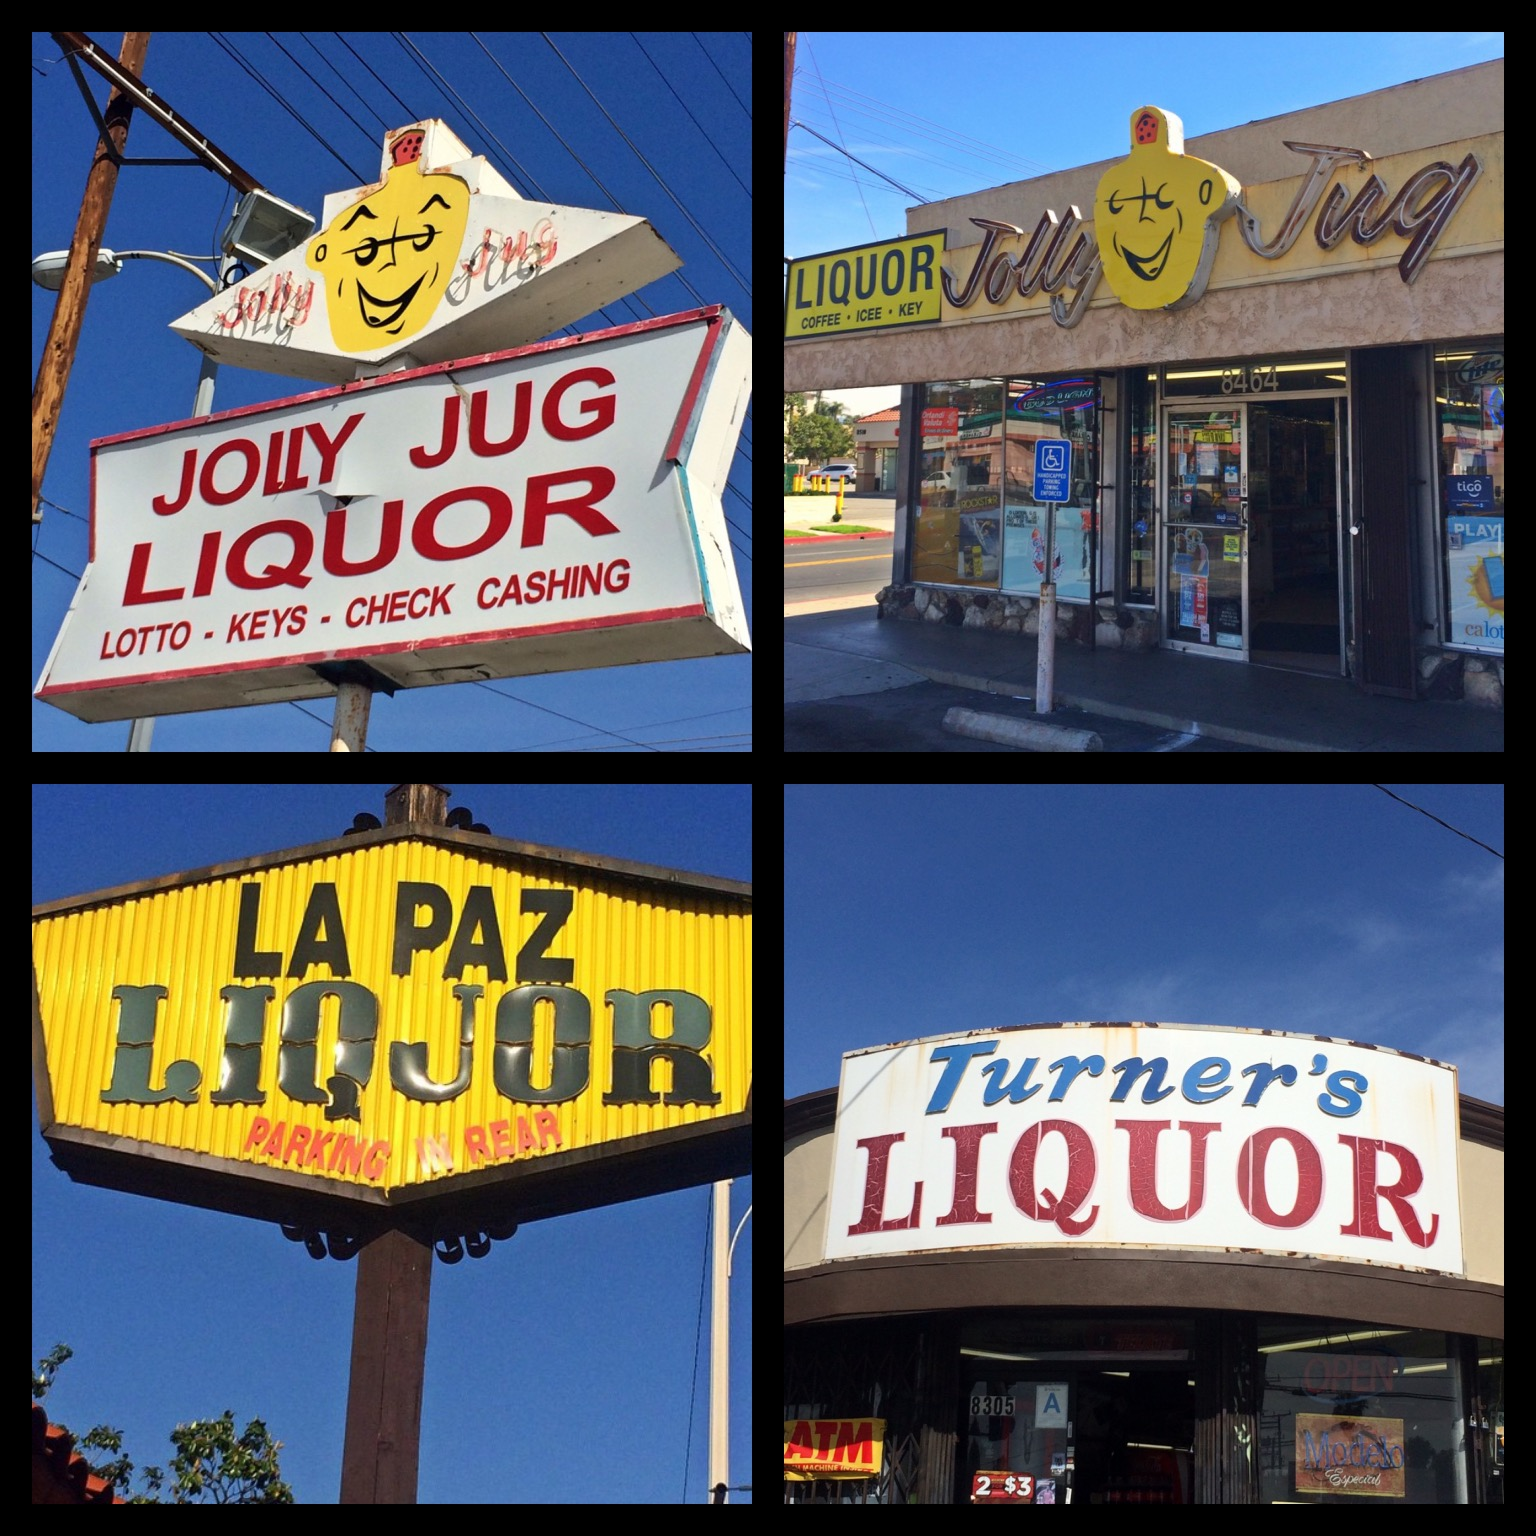 Jolly Jug Liquor was built in 1960 on Reseda Blvd in Reseda; La Paz Liquor on Magnolia Blvd in Burbank; Turner's Liquor on Balboa Blvd in Northridge